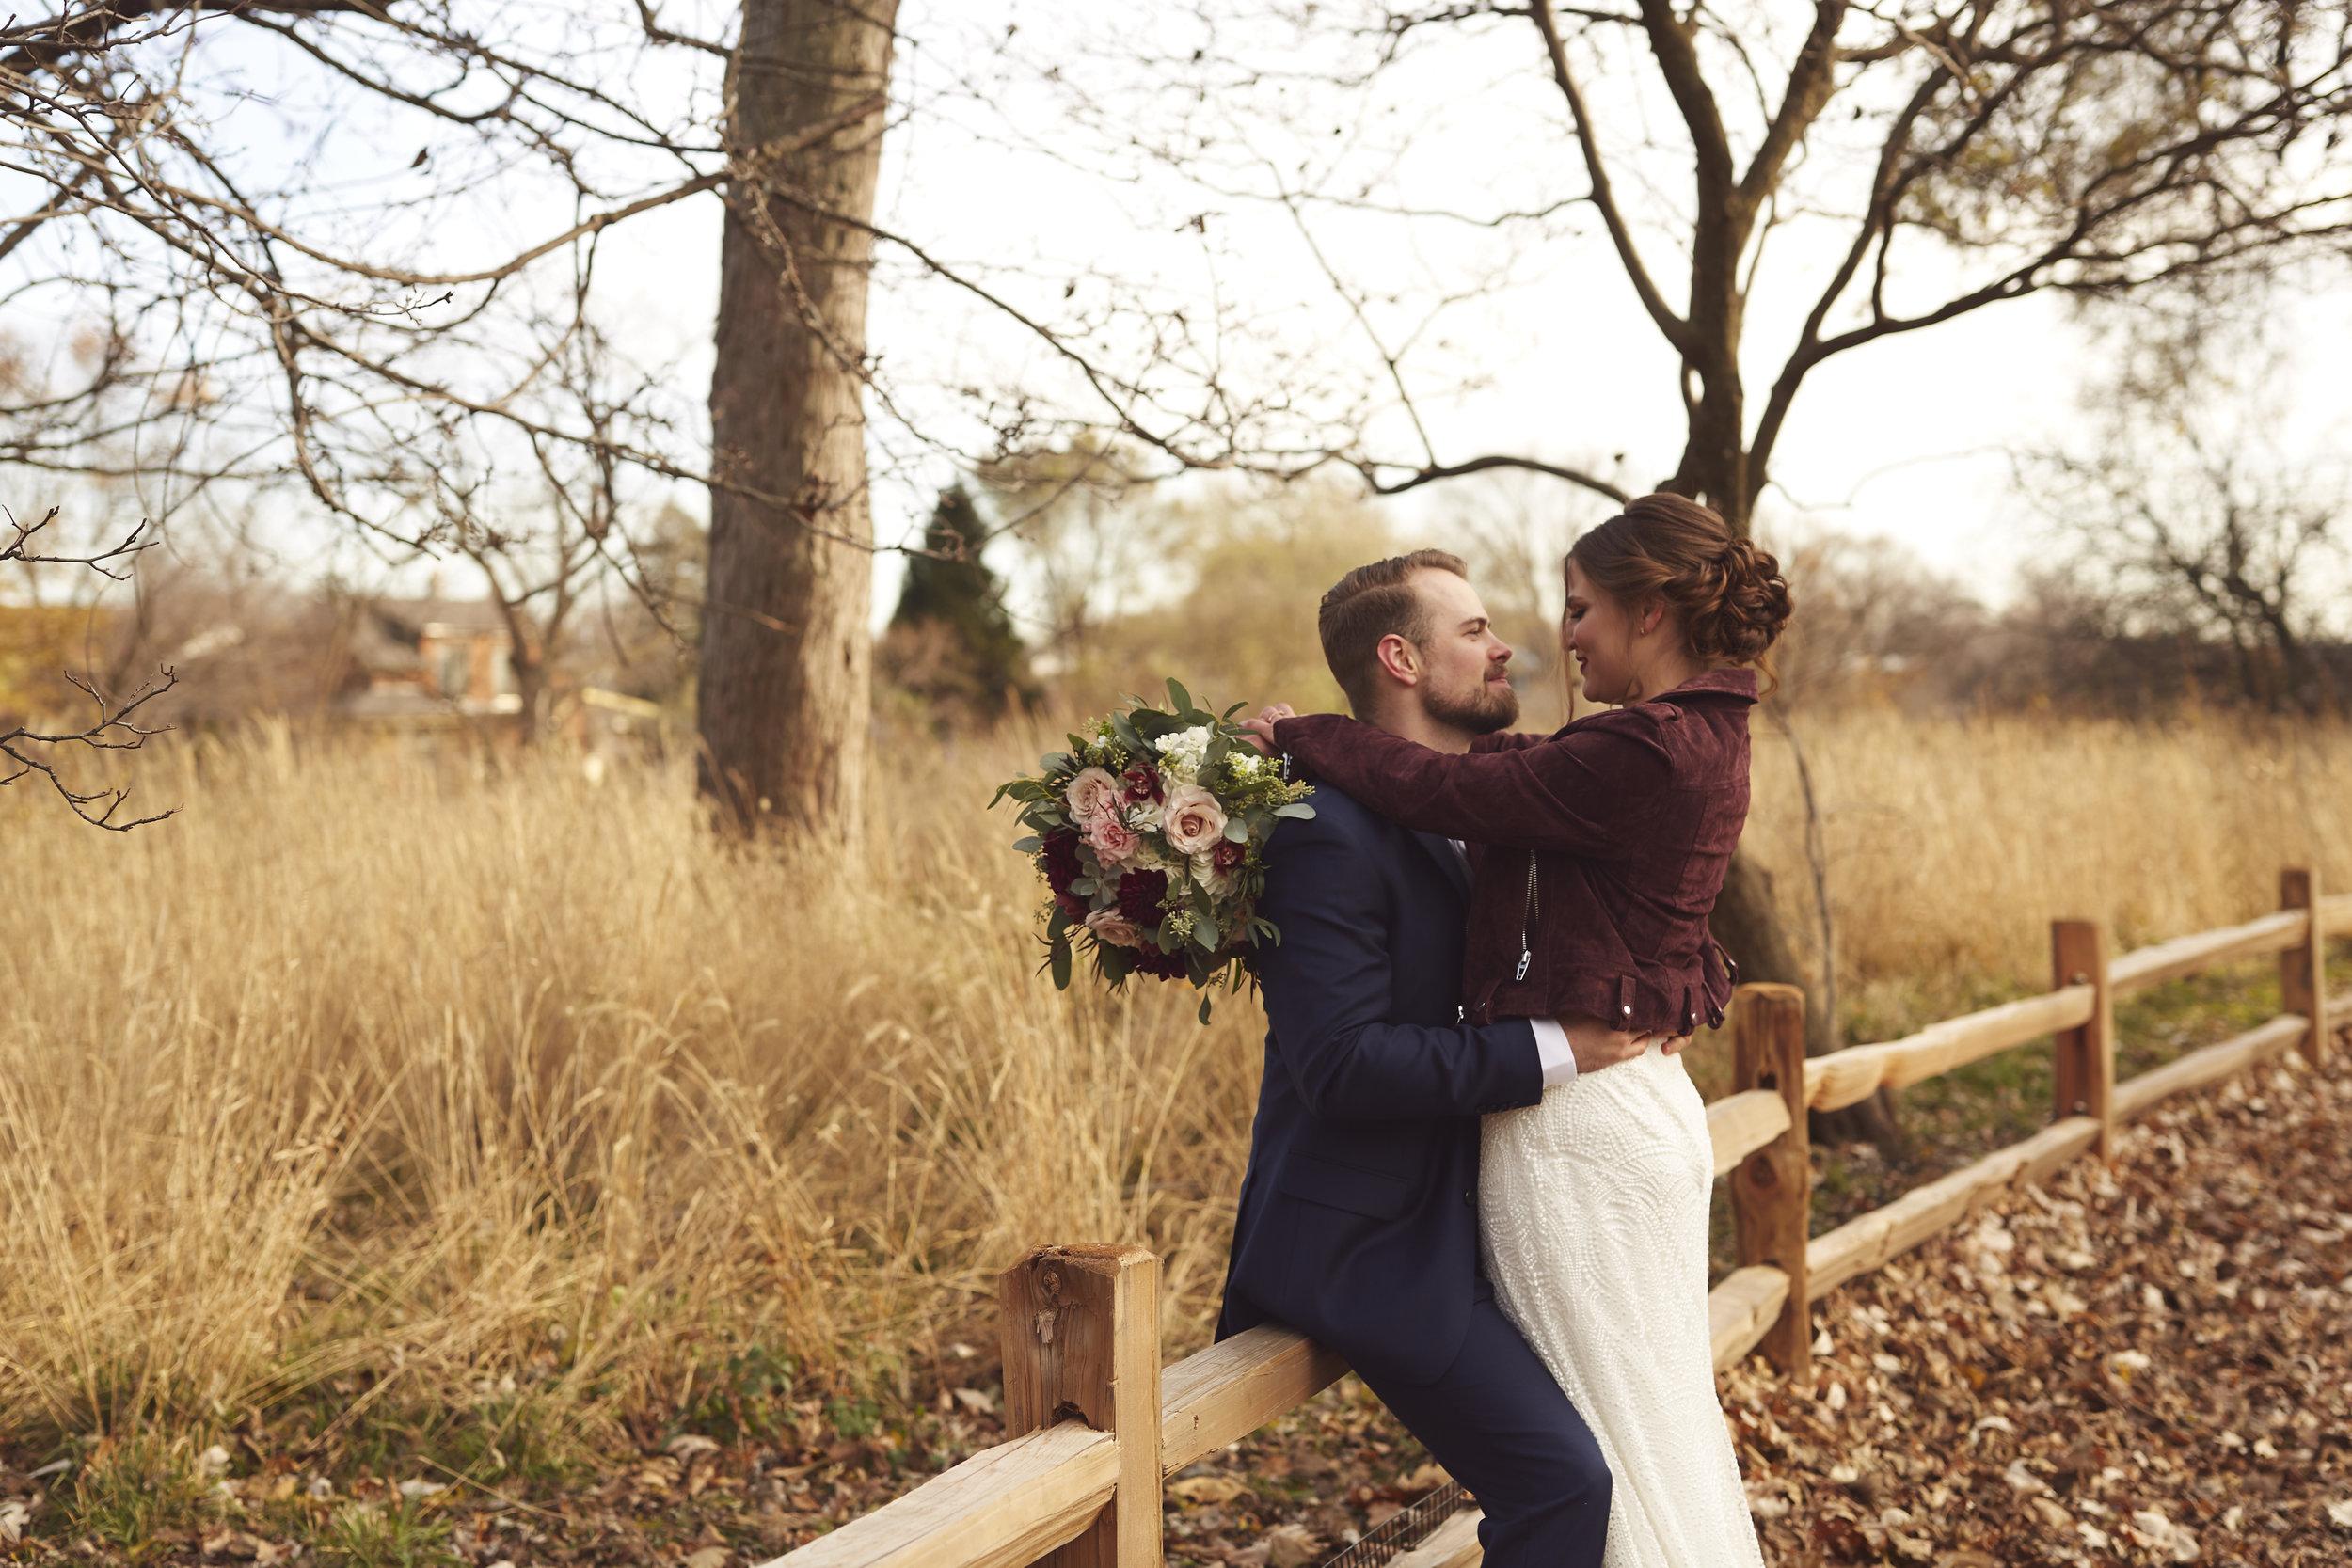 Jen & Ben Wedding - benromangphoto - 6I5A9946.jpg